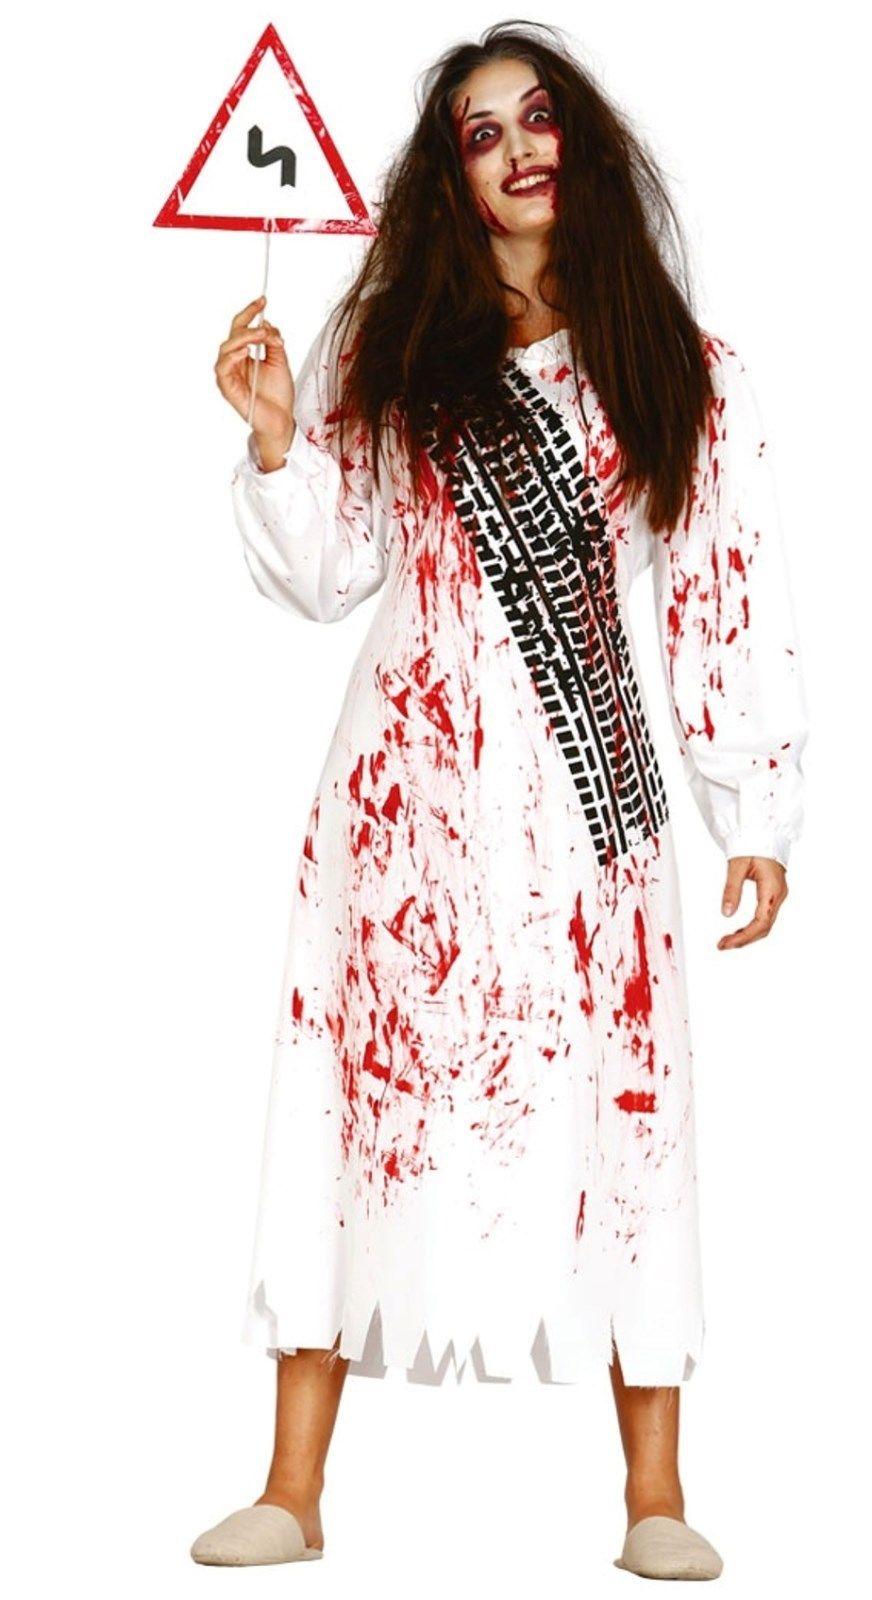 Ladies White Zombie Corpse Costume Asylum Horror Halloween Fancy Dress Road Sign